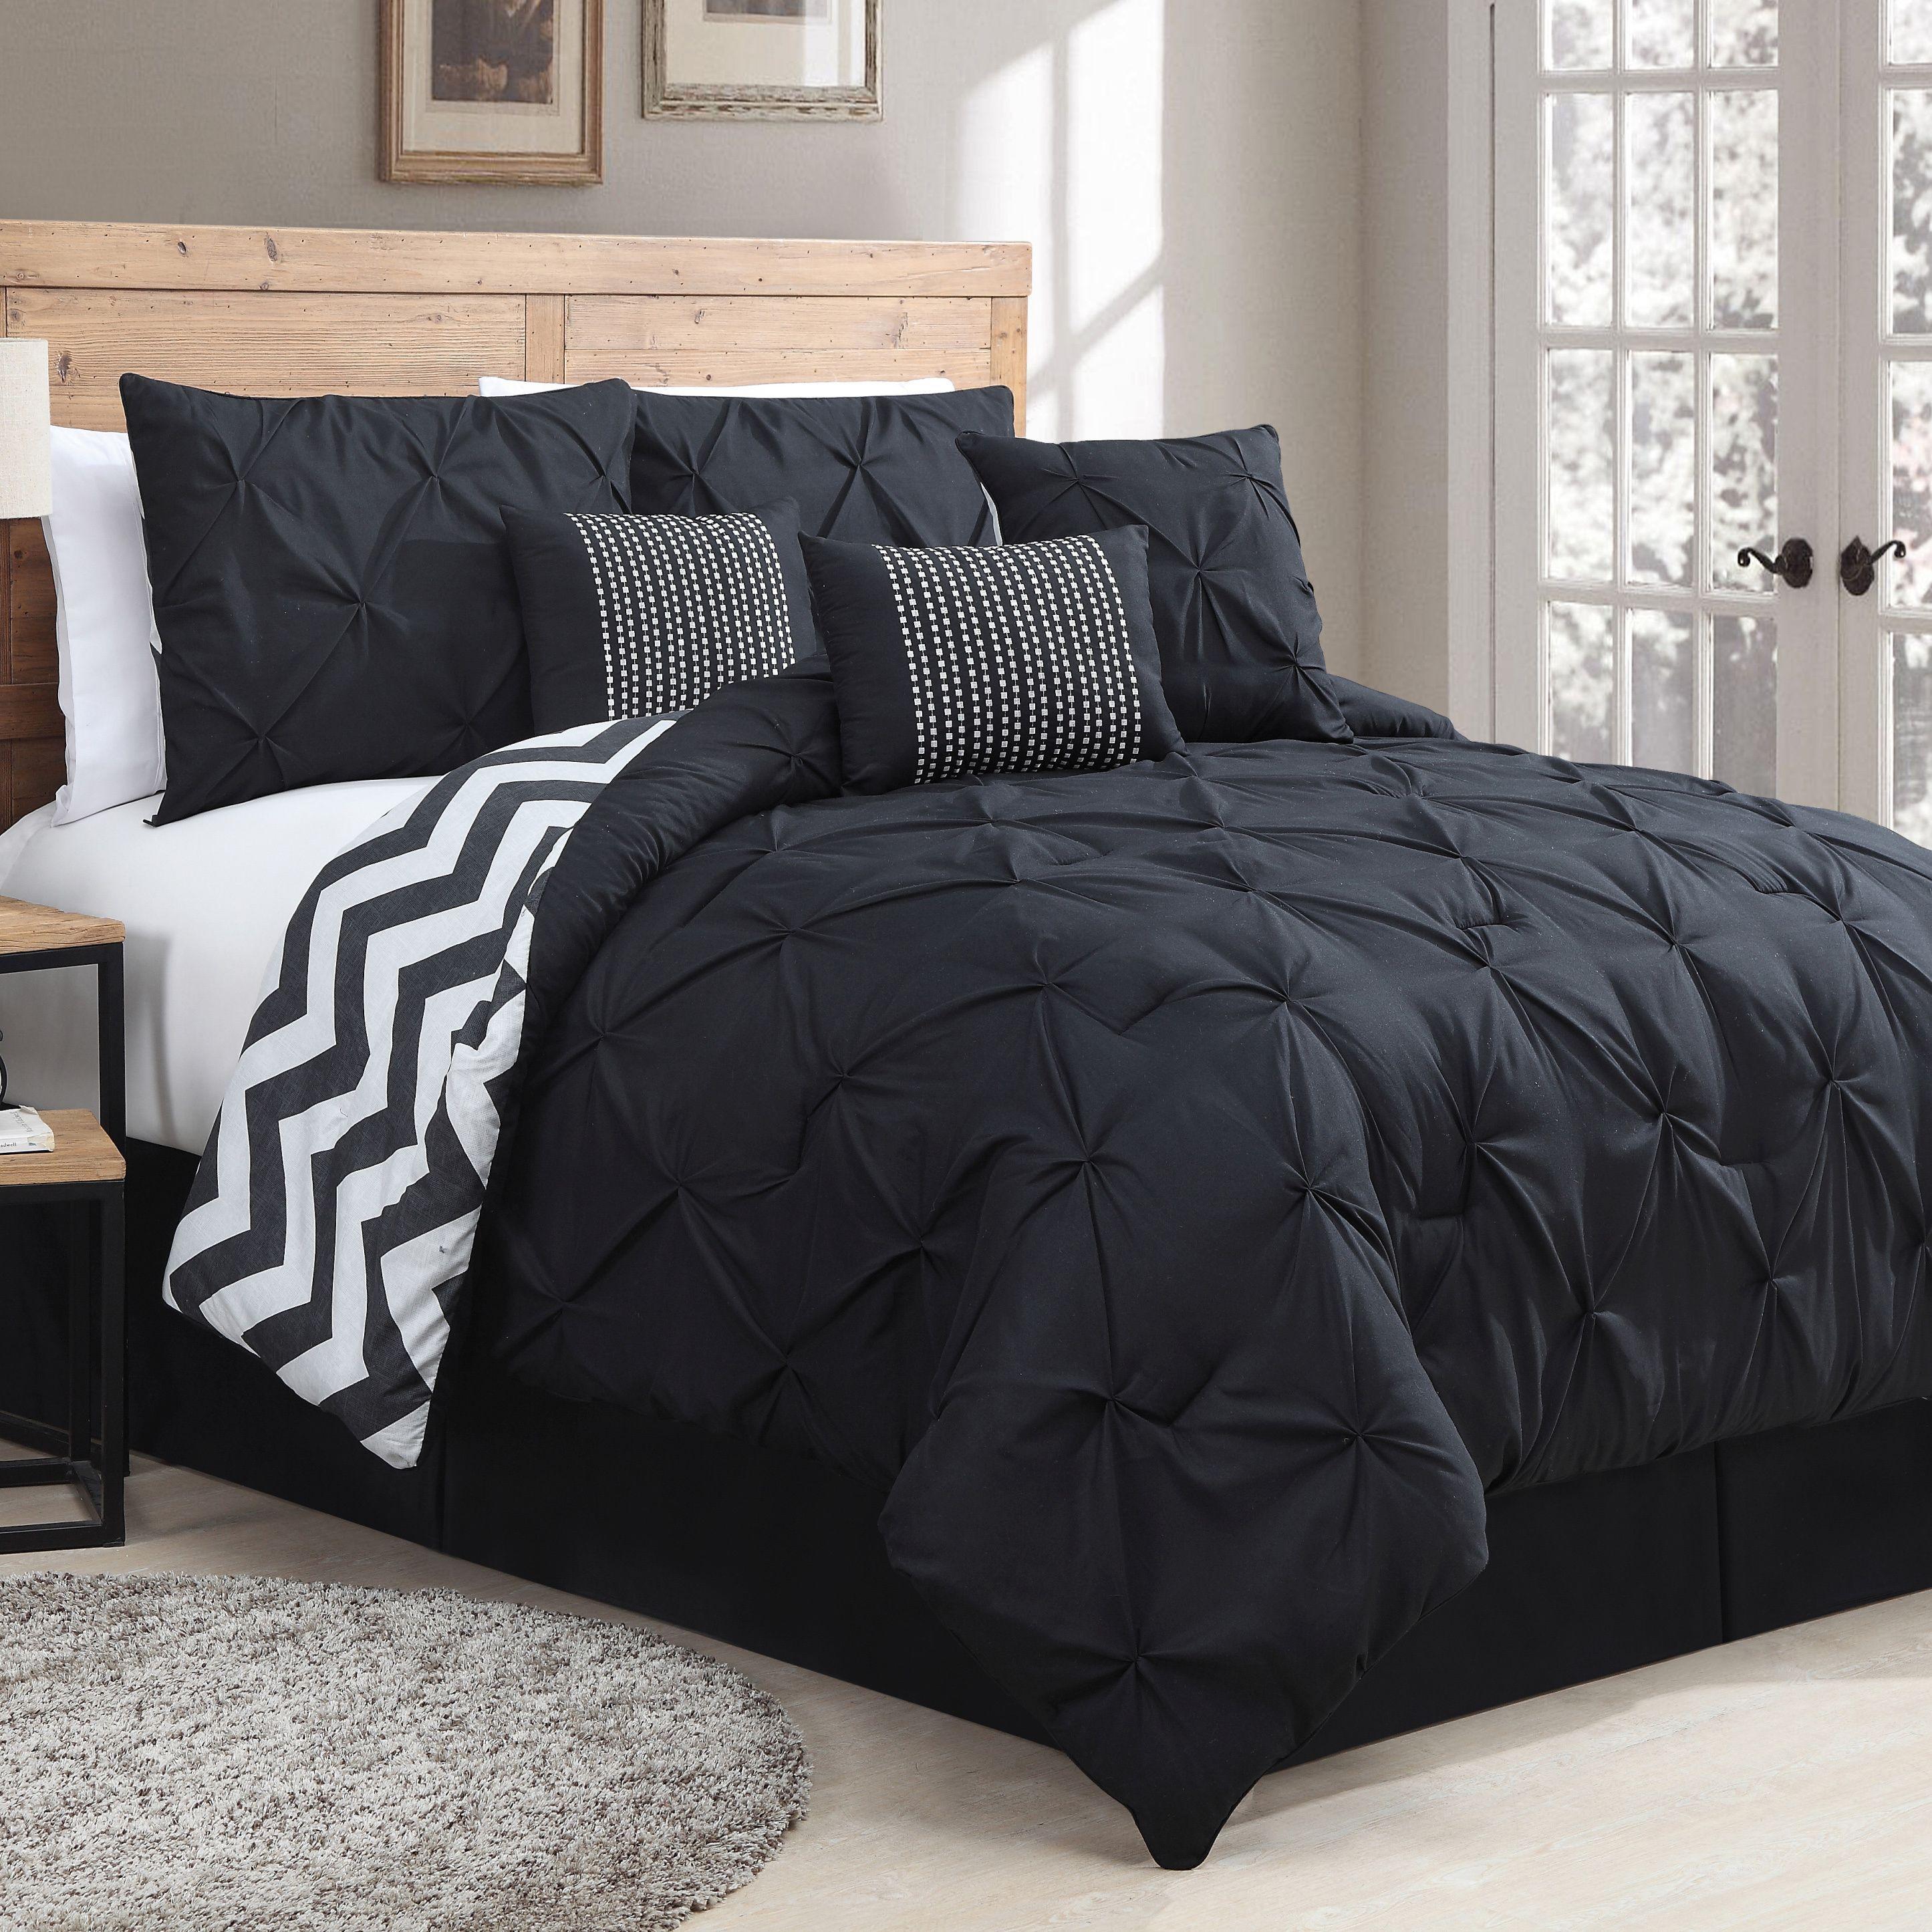 King Bedroom Sets For Sale Canada